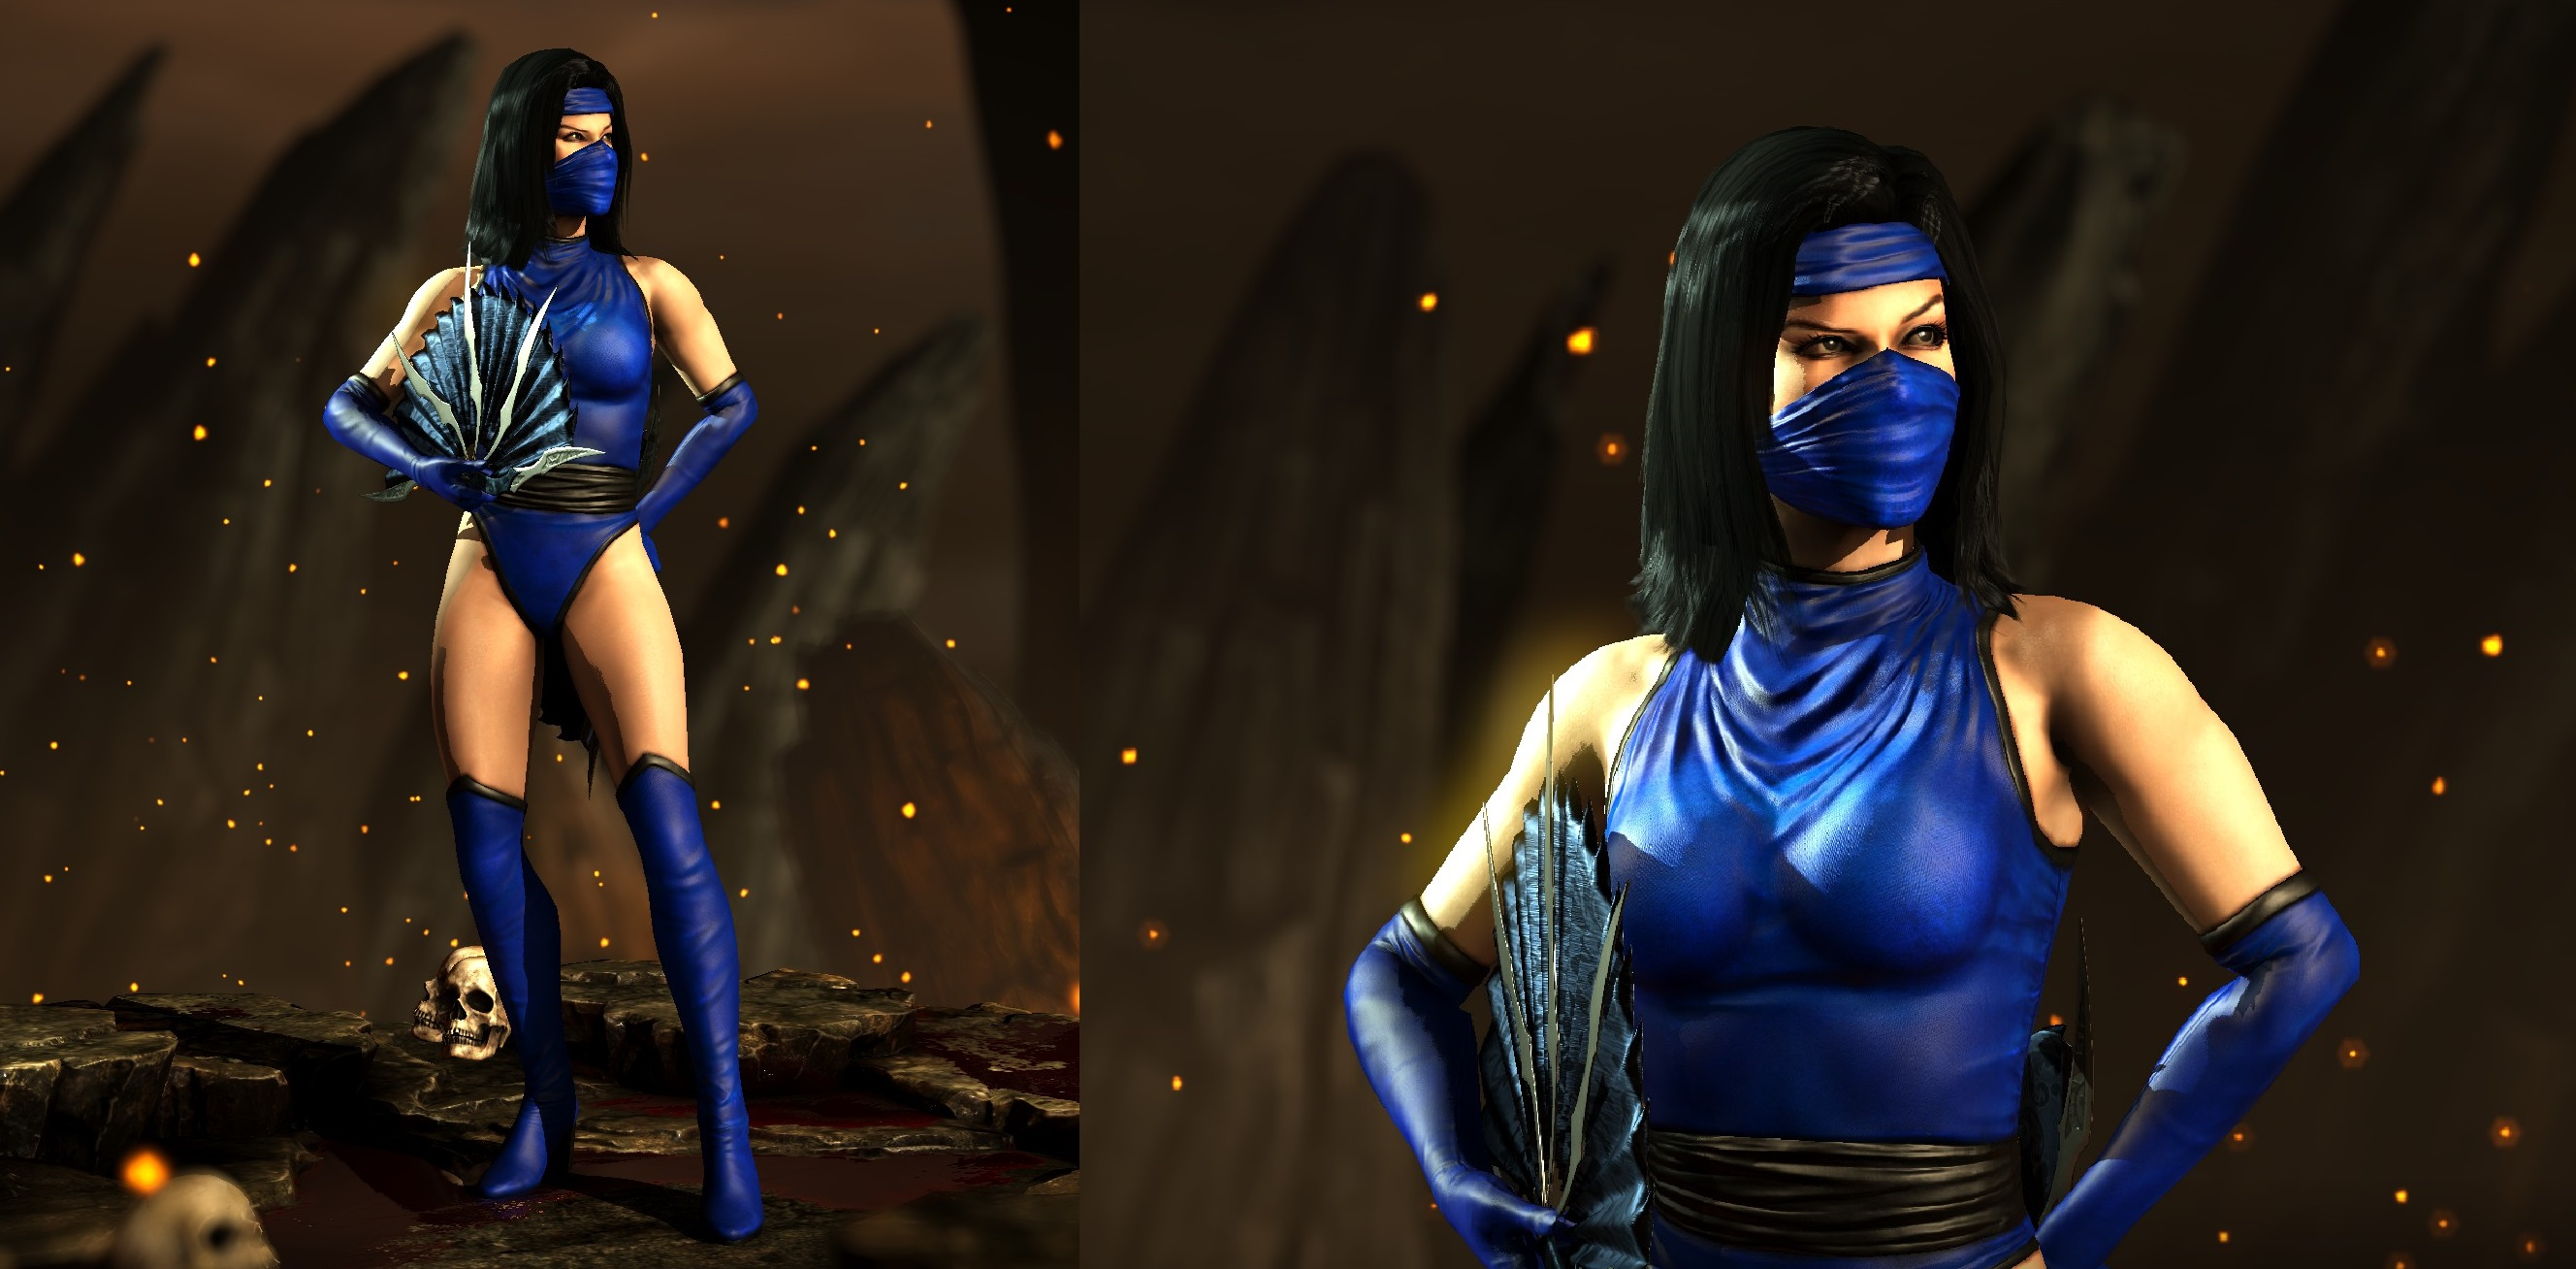 Kitana Mk2 edited kitana 6 image ...